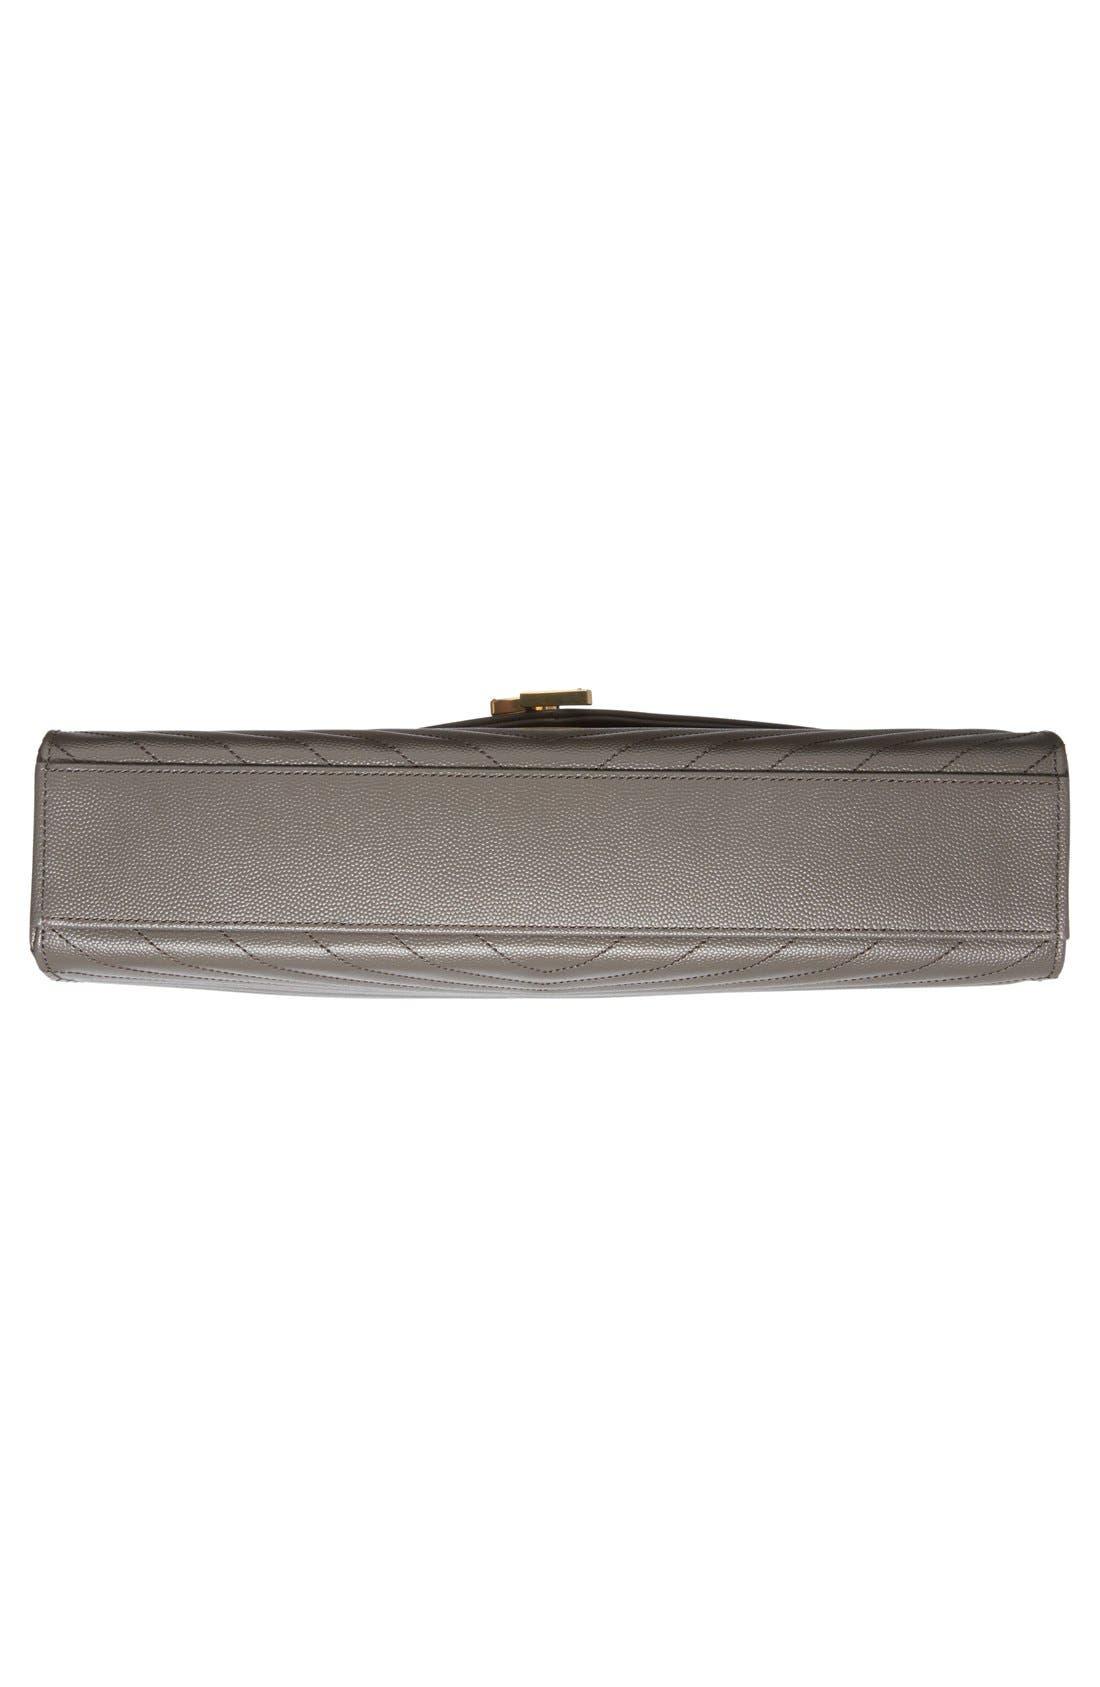 ,                             'Large Monogram' Grained Leather Shoulder Bag,                             Alternate thumbnail 18, color,                             020